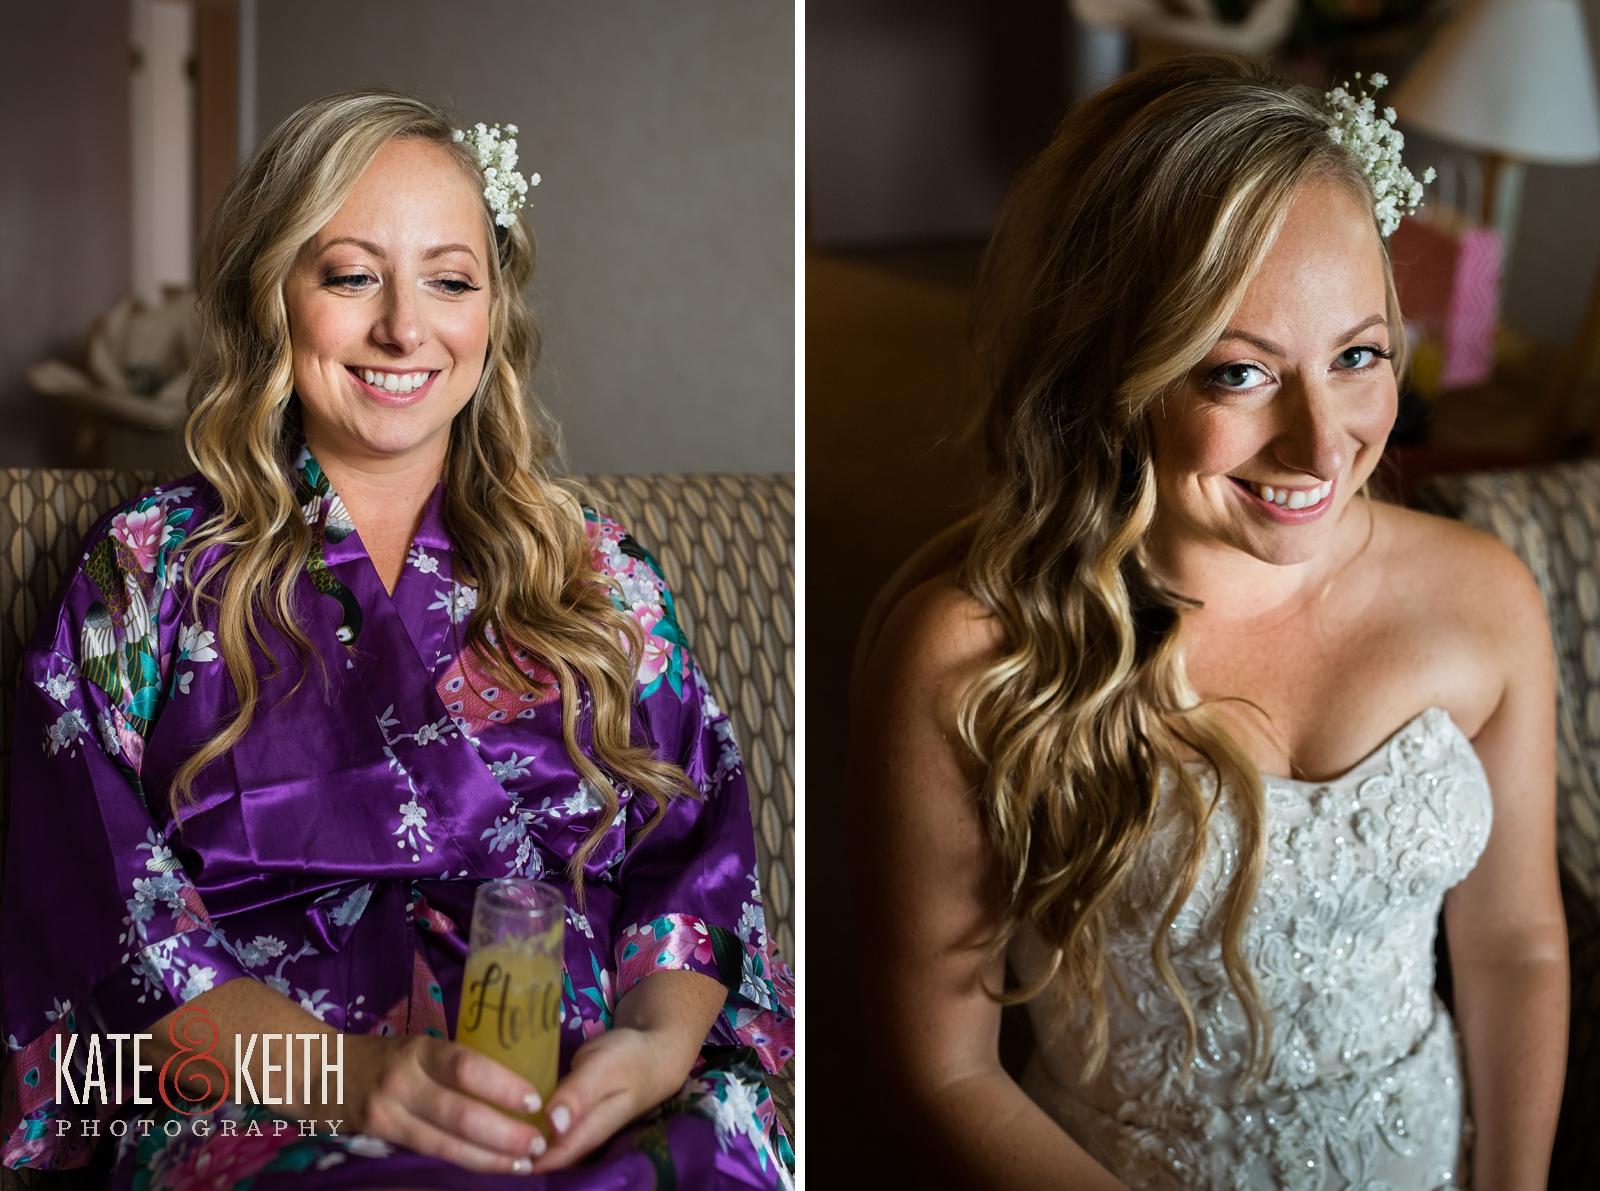 New Hampshire, Lakes Region, Lake Winnipesaukee, The Margate Resort, wedding, outdoor wedding, lakeside wedding, wedding gown, bride robe, bride kimono, bridal jewelry, bride getting ready, bridal portrait